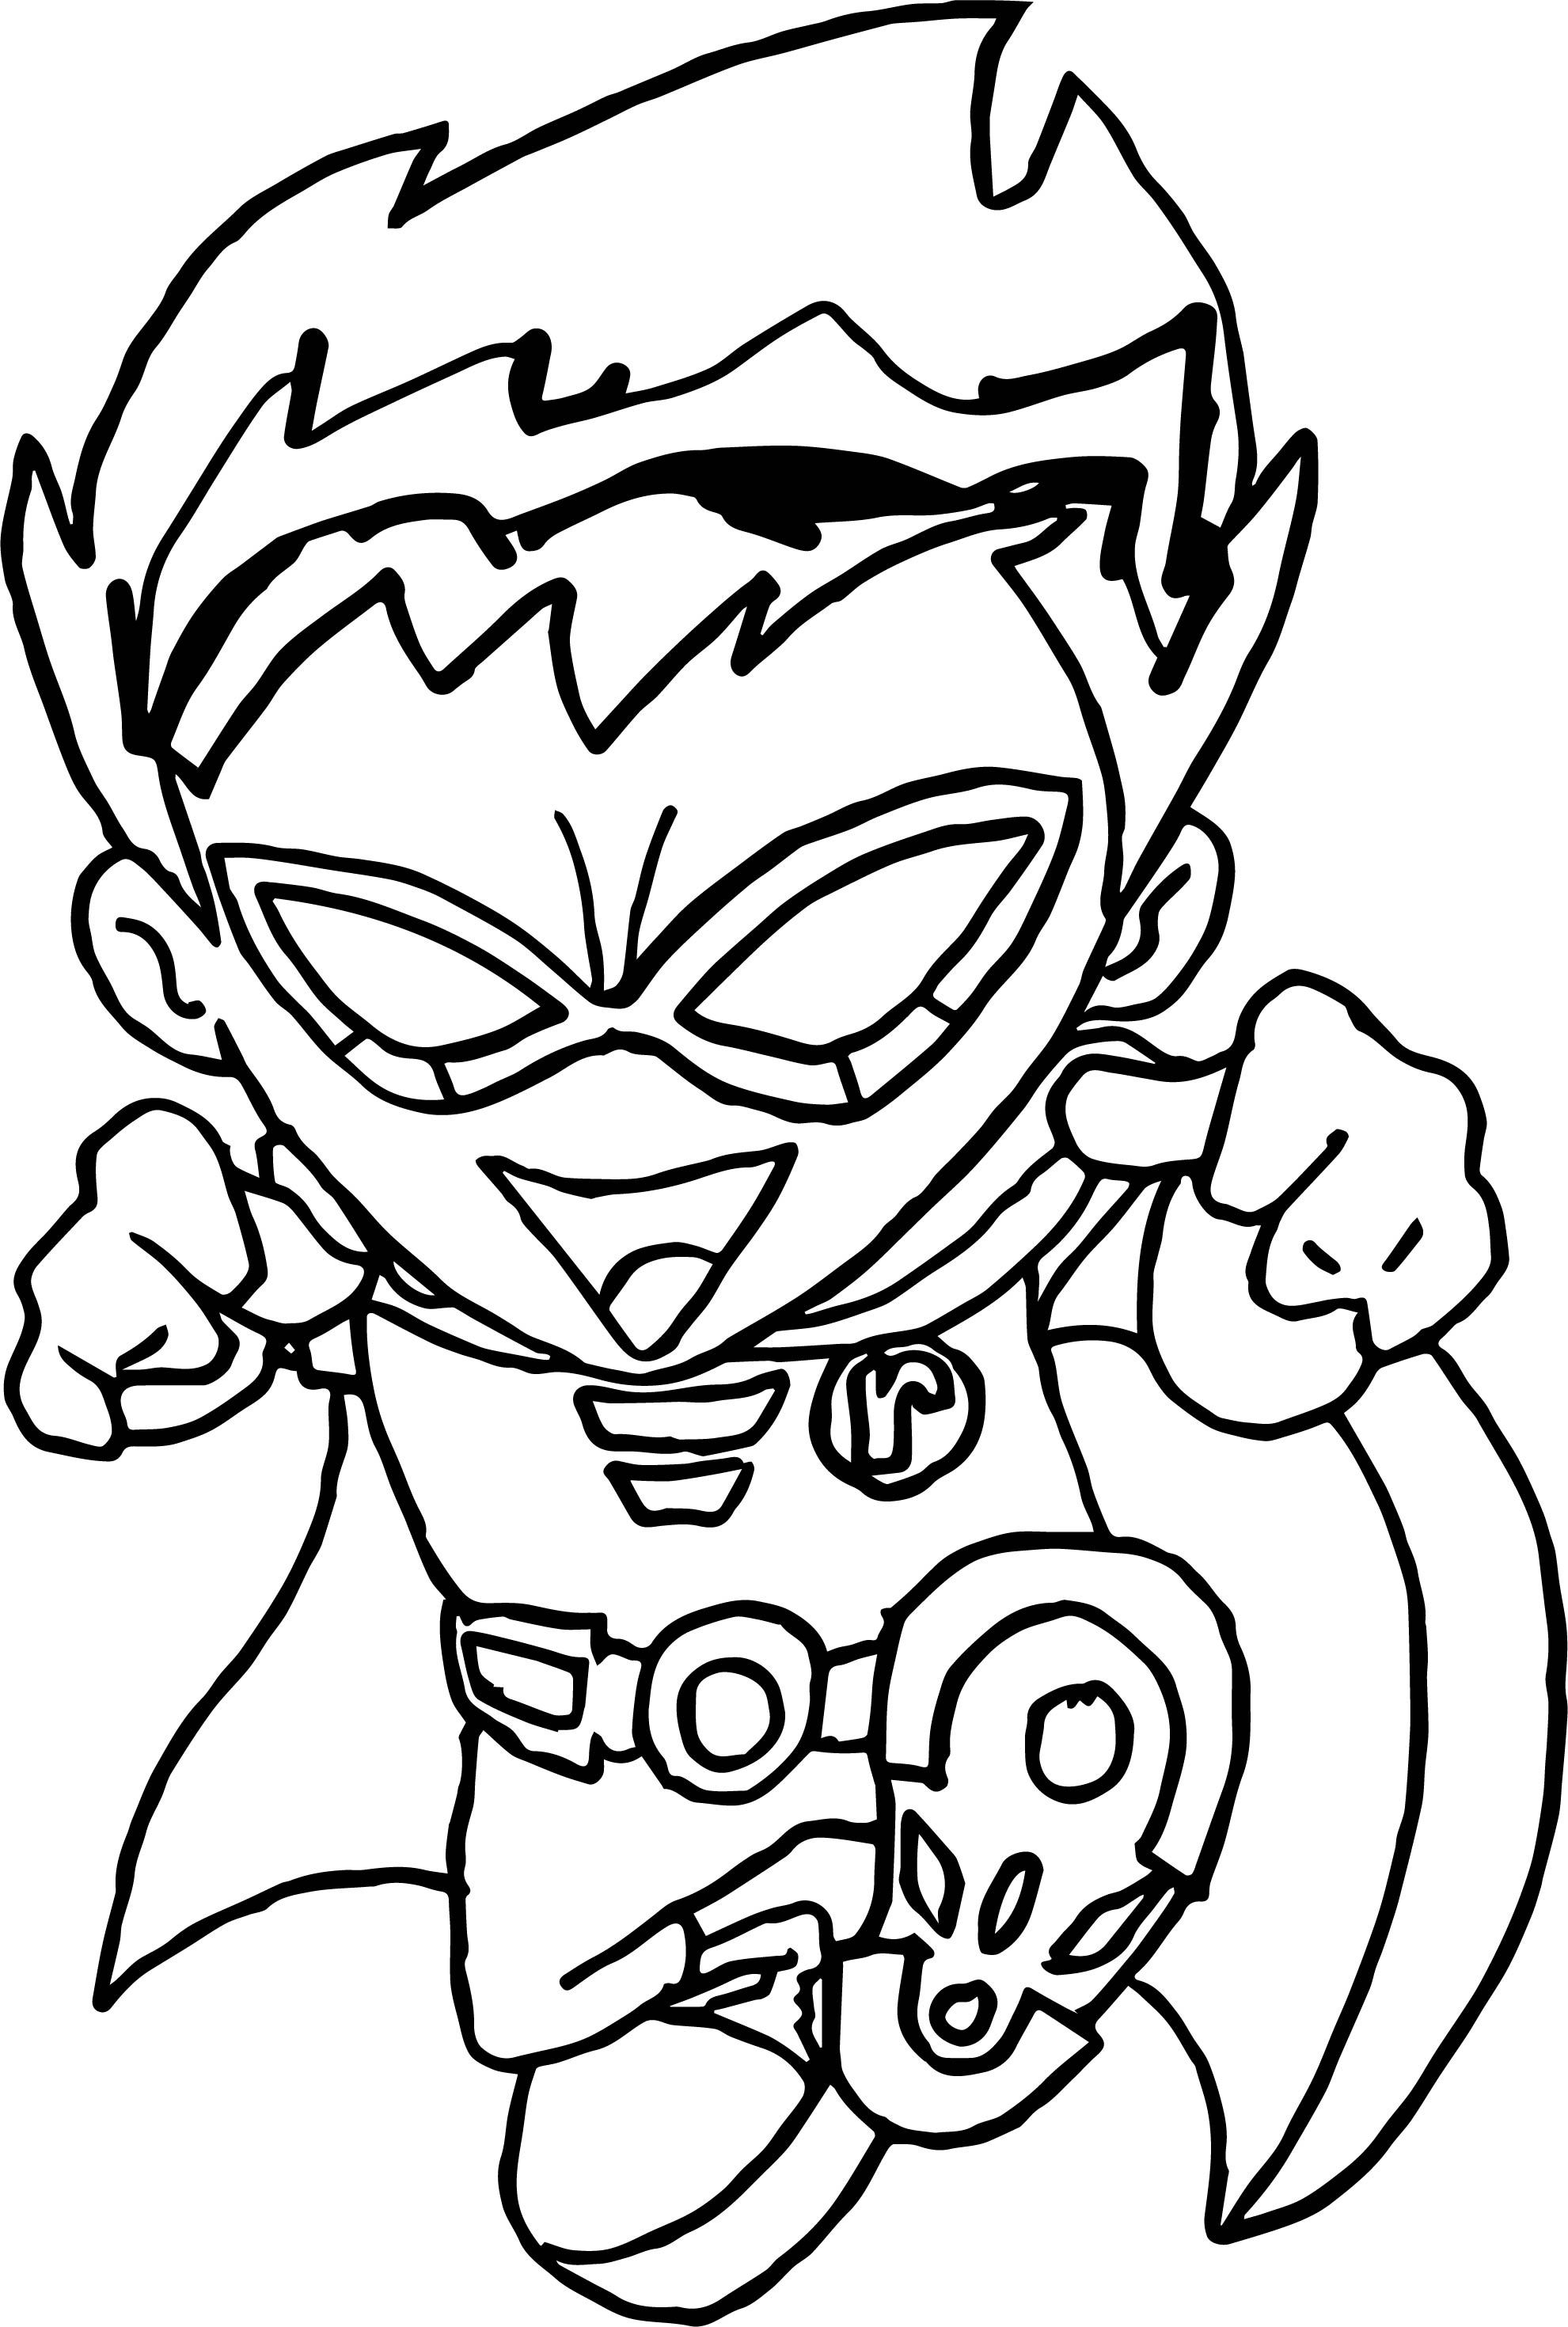 Nice Robin Batman Chibi Coloring Page Superhero Coloring Pages Chibi Coloring Pages Batman Chibi